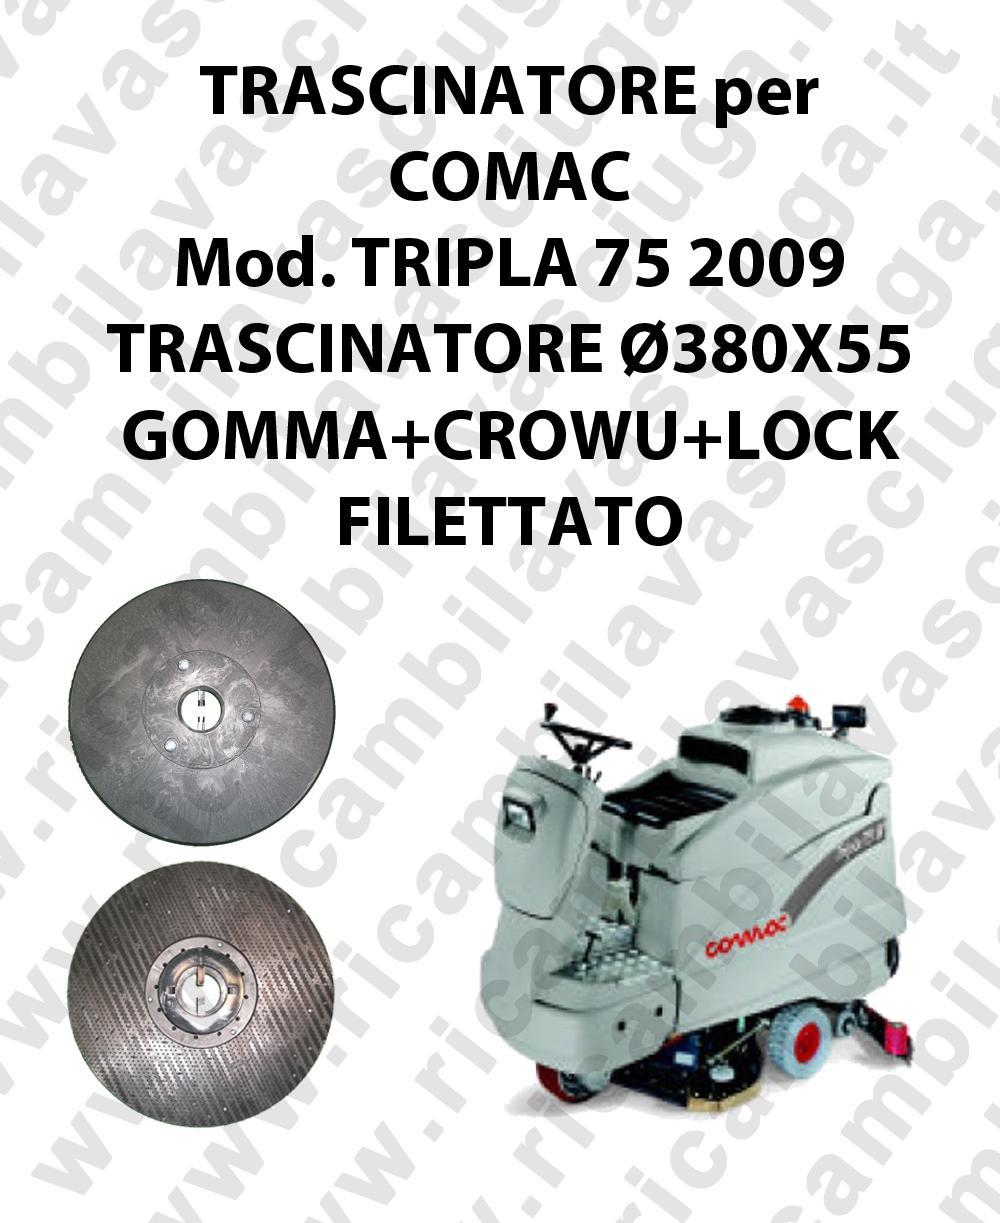 Padholder for scrubber dryer COMAC model TRIPLA 75 2009